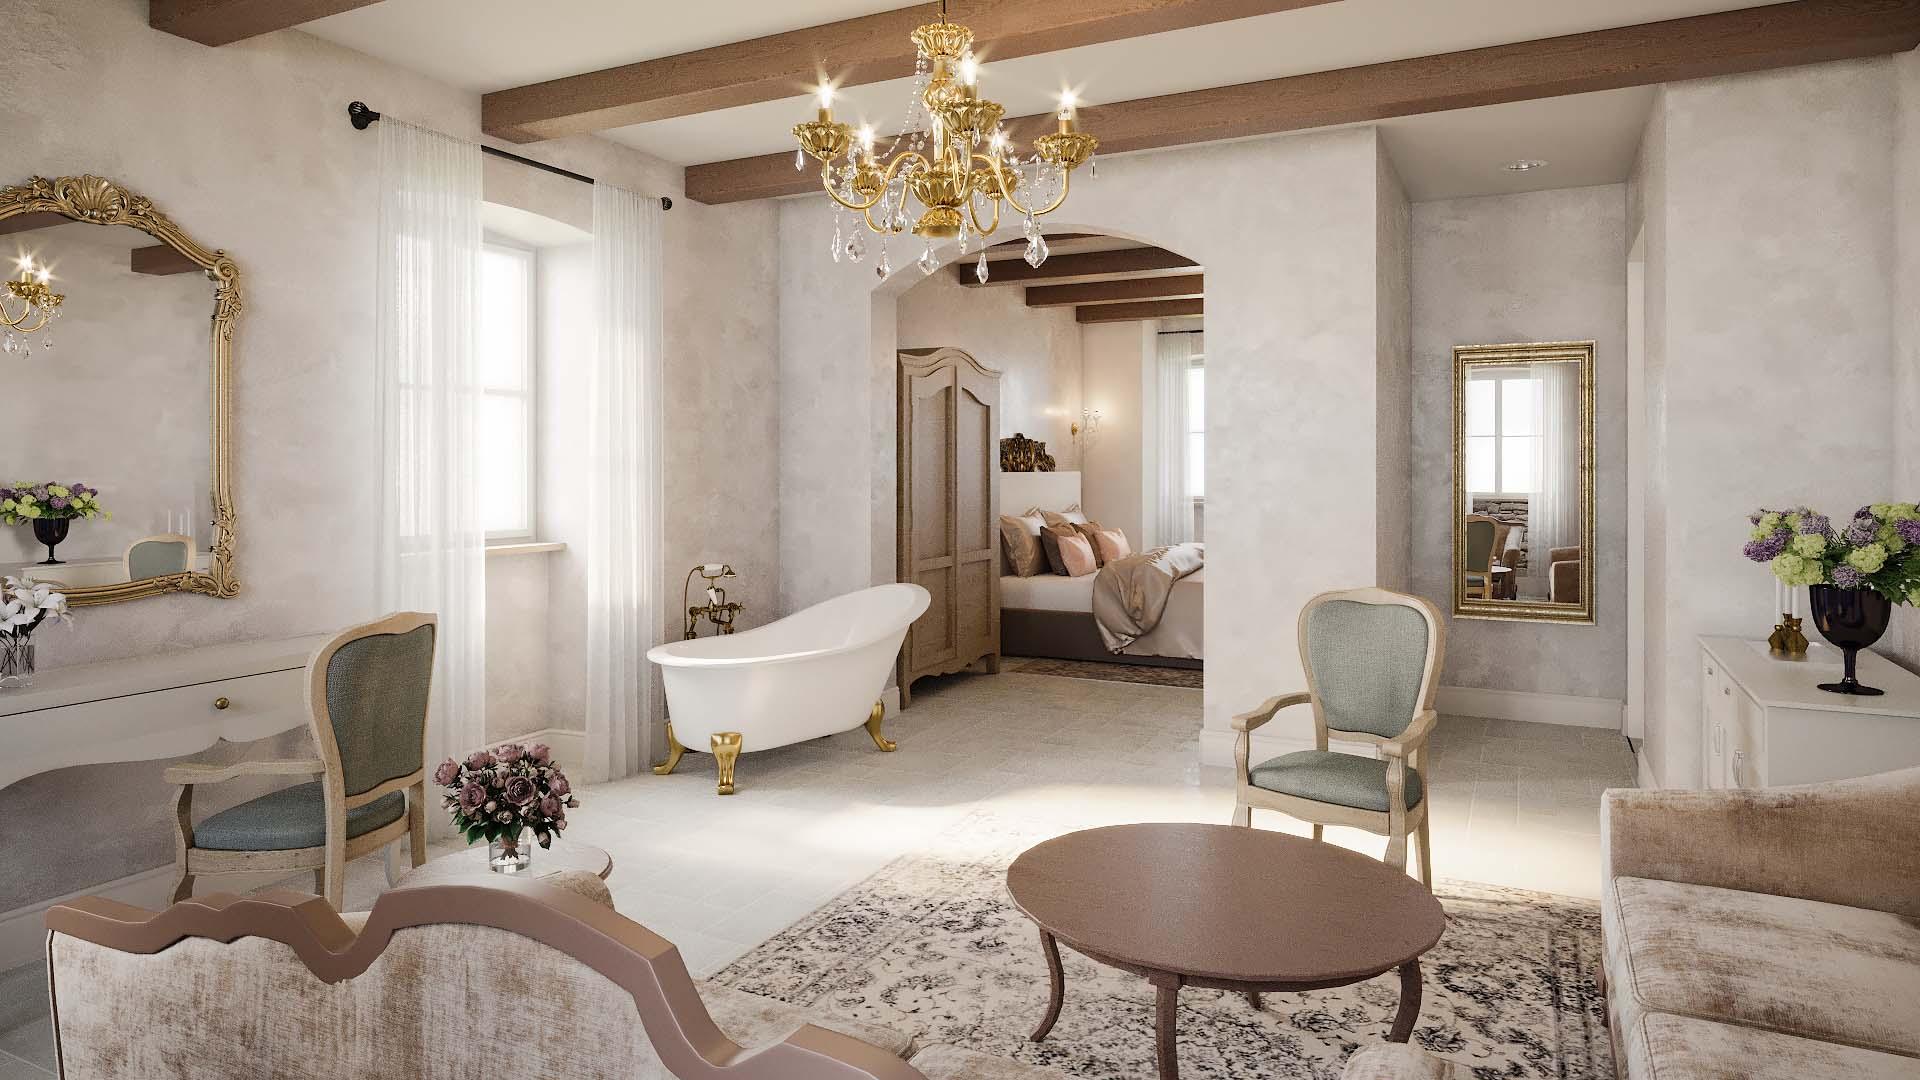 POKE_studio_services_hospitality_hotel_apartment.jpg